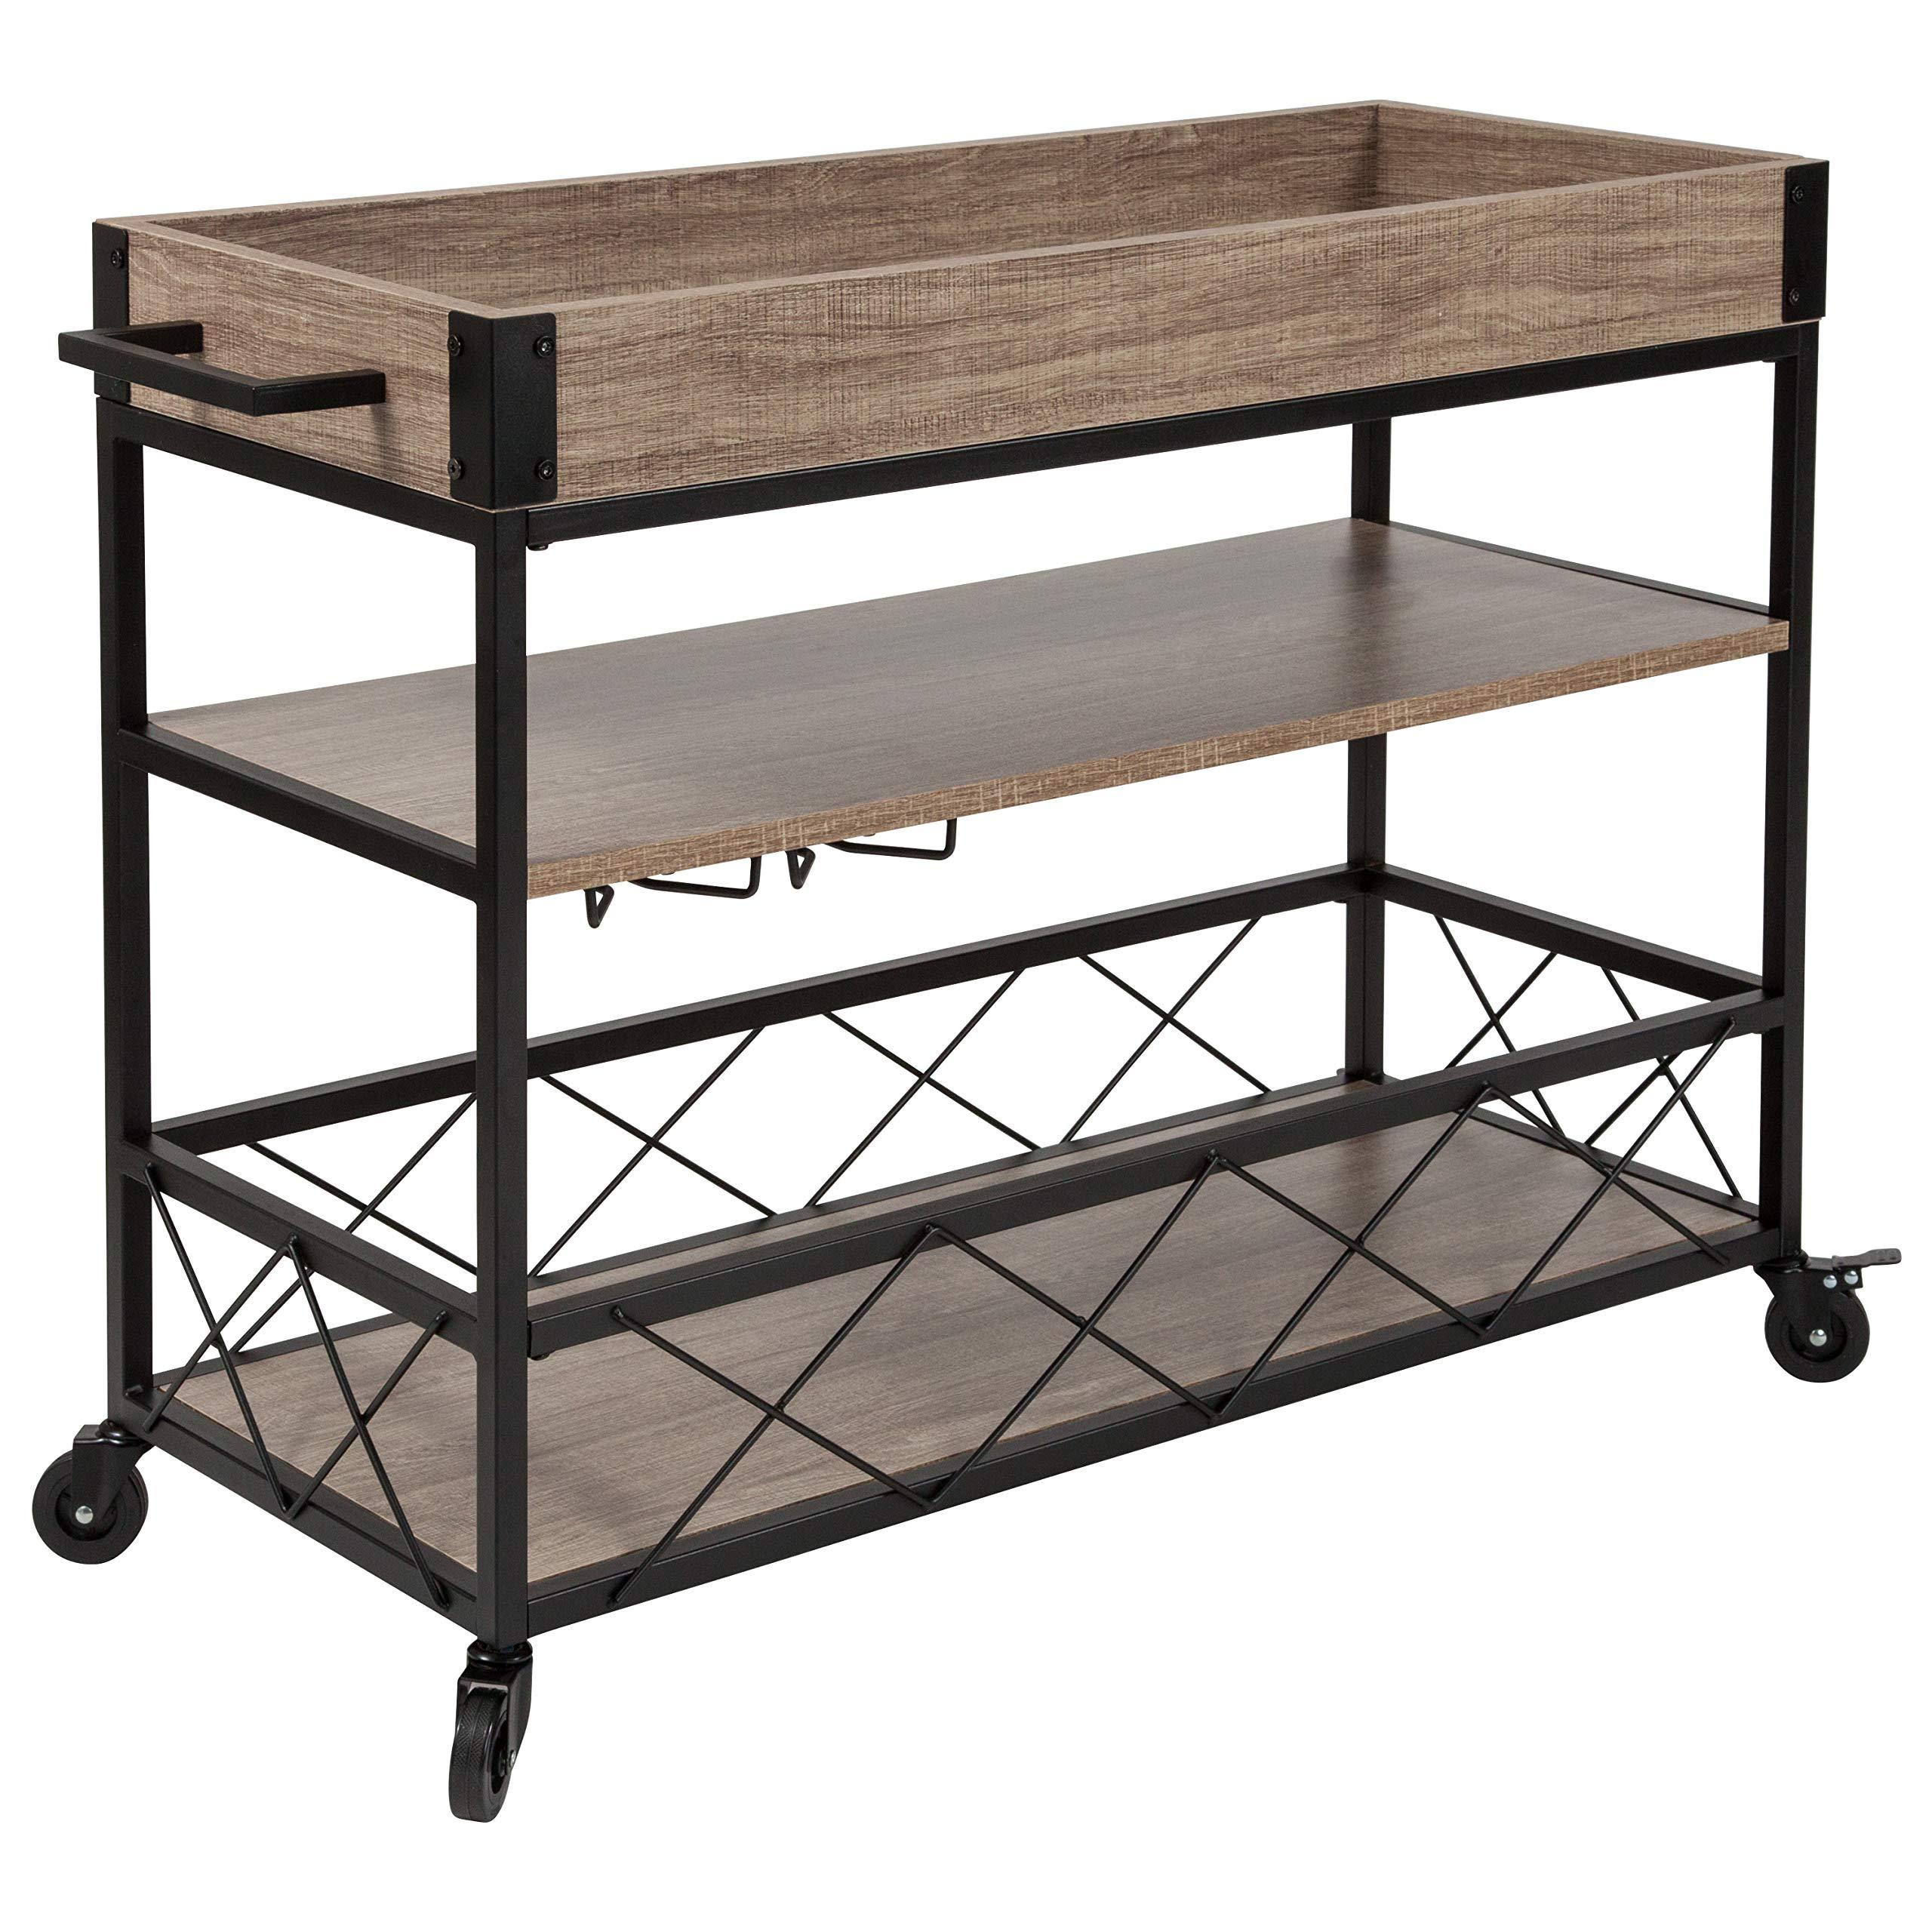 Taylor + Logan Distressed Wood Kitchen Bar Cart with Storage Rack and Shelf, Light Oak by Taylor + Logan